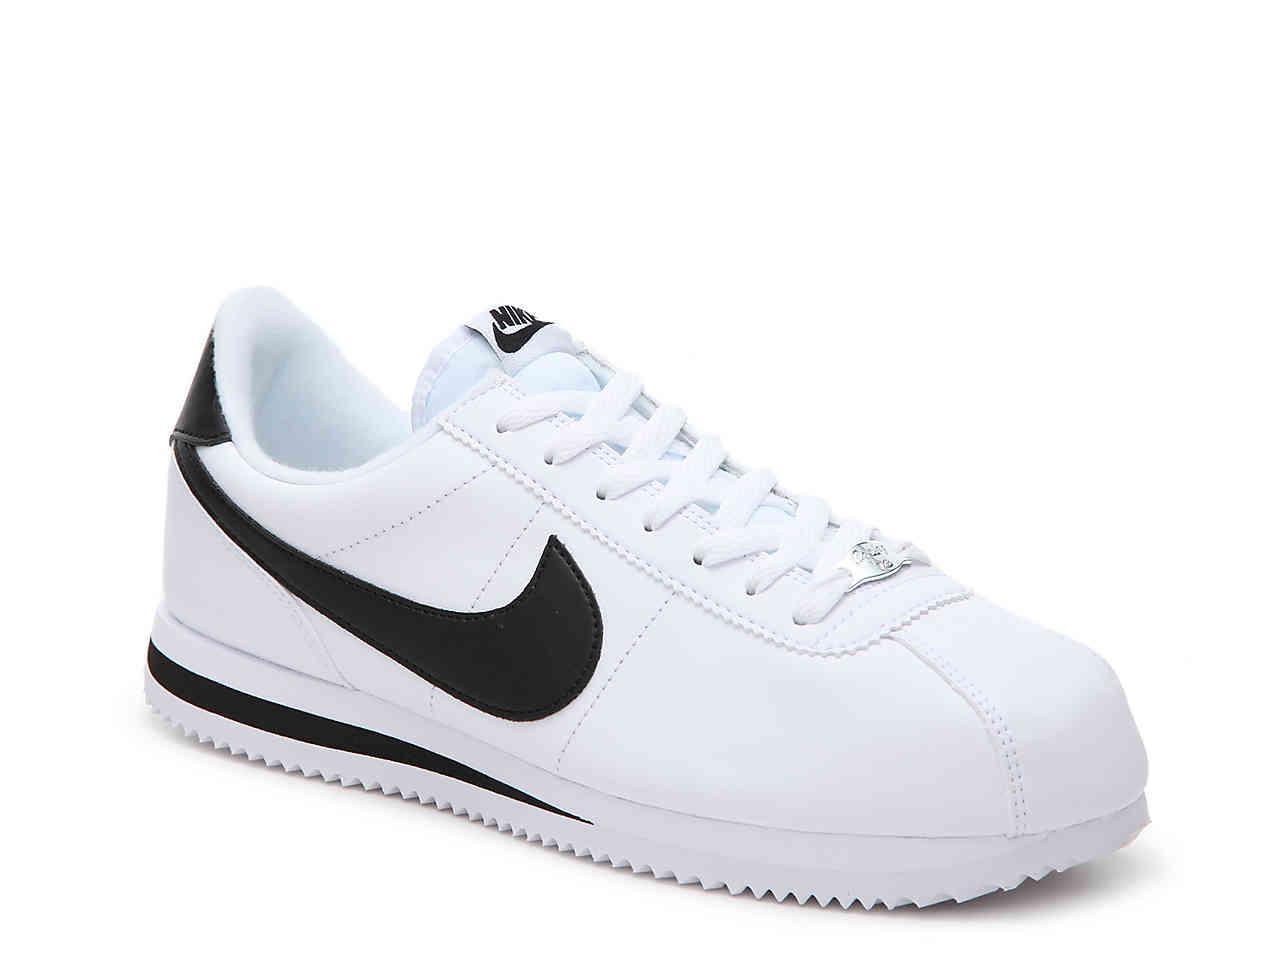 best website 65c35 e27b8 Nike. Mens White Cortez Basic Leather